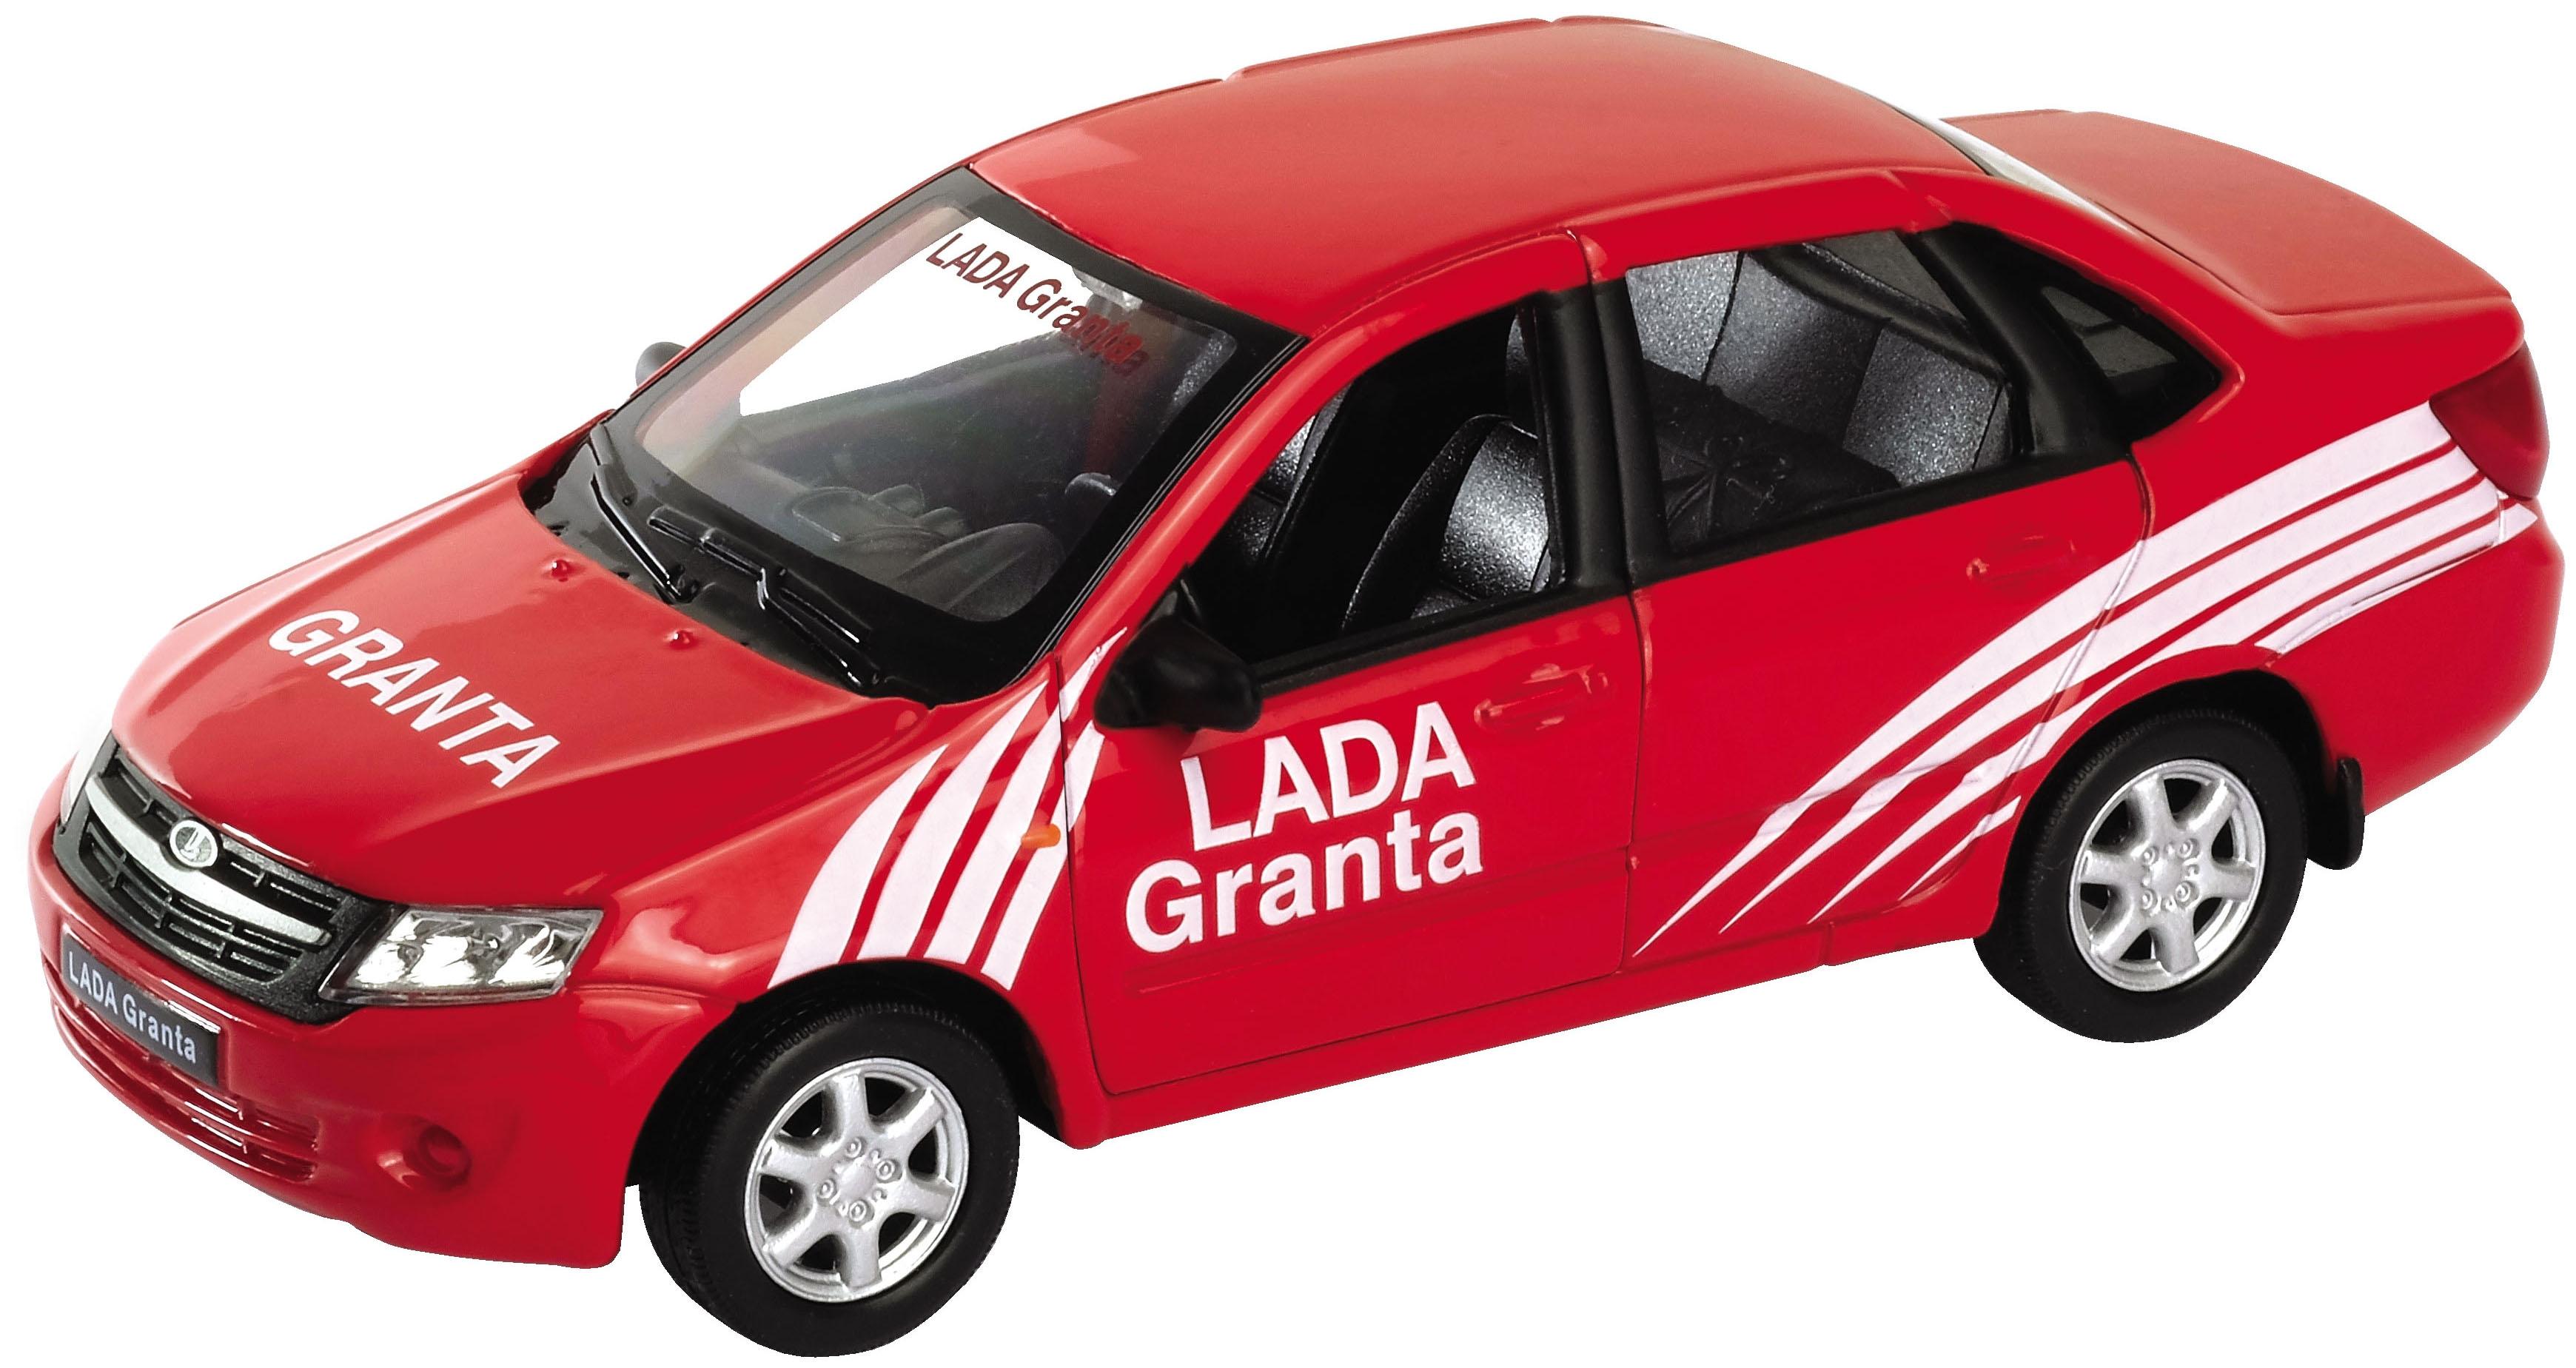 Машинки и мотоциклы Welly Модель машины Welly «Lada Granta Rally» 1:34-39 welly lada kalina rally 42383ry